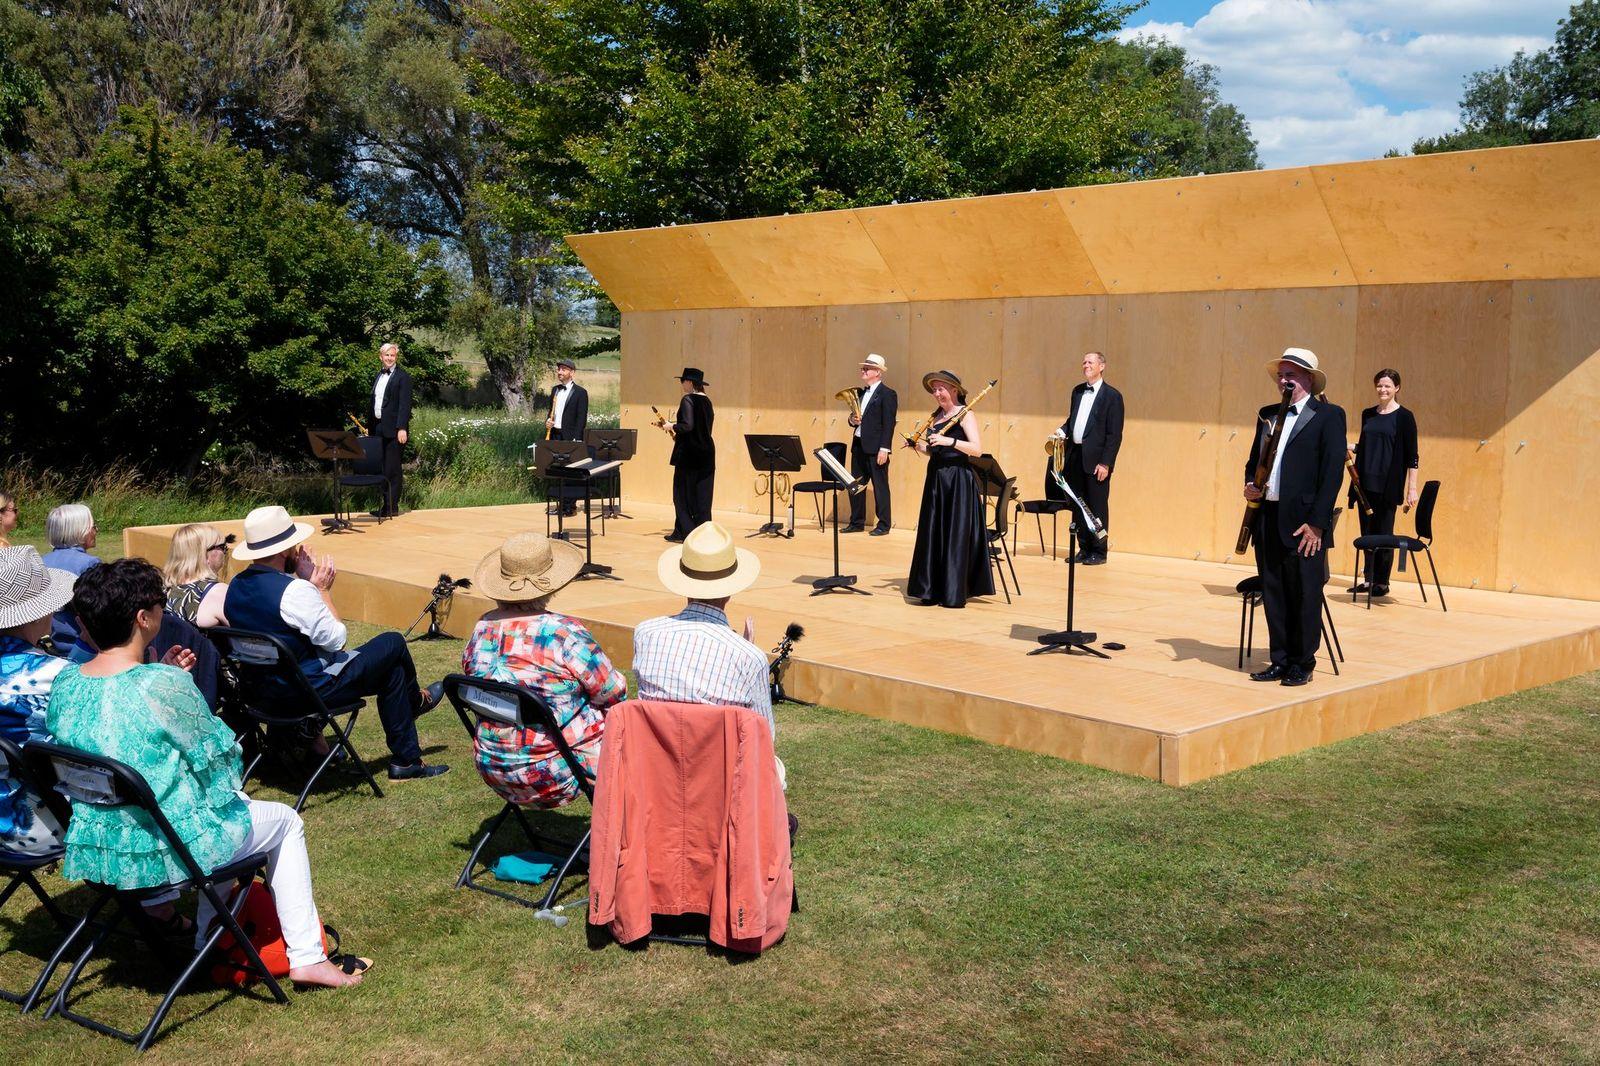 The Corona concert stage at Glyndebourne. (Photo: Glyndebourne Festival)